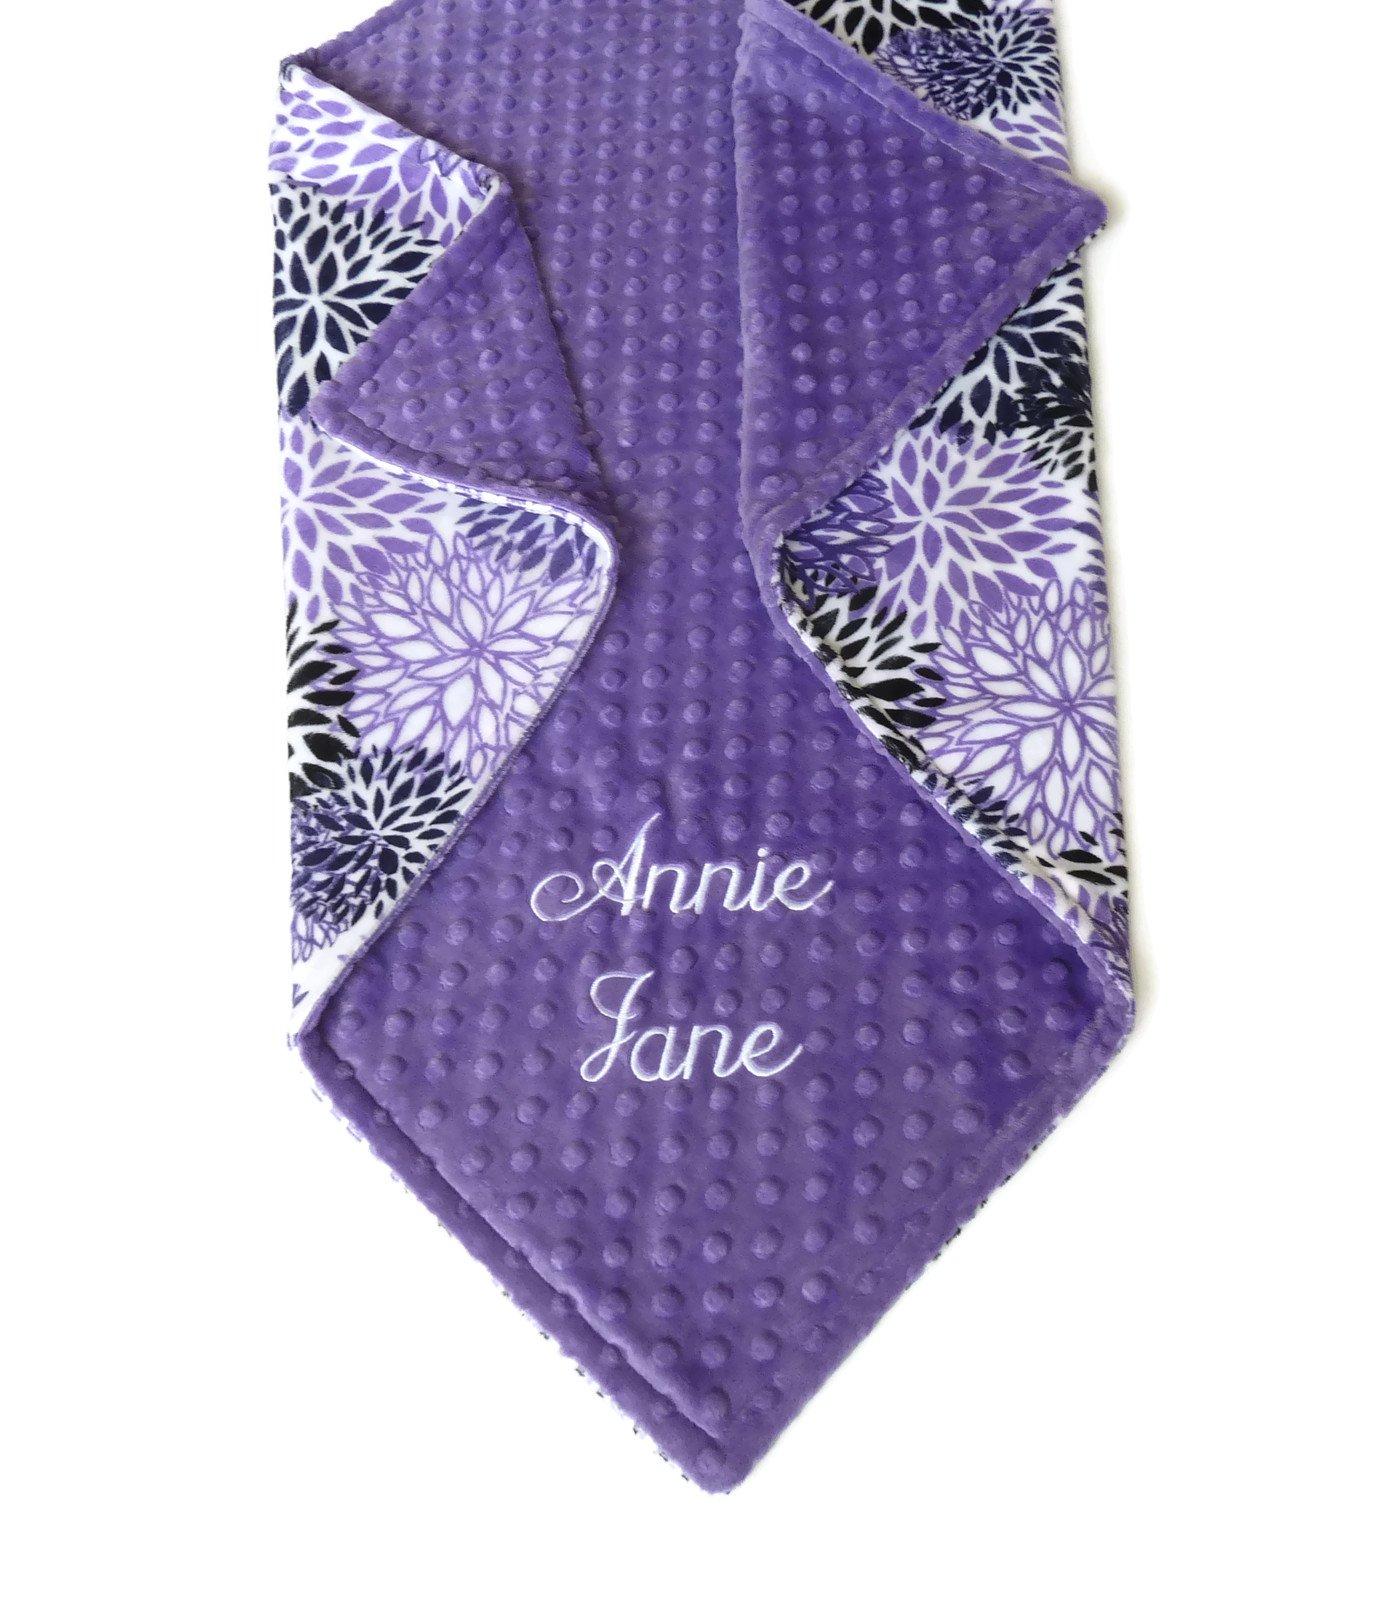 Personalized Baby Blanket or Lovey, Personalized Minky Baby Blanket, Purple Blooms Blanket